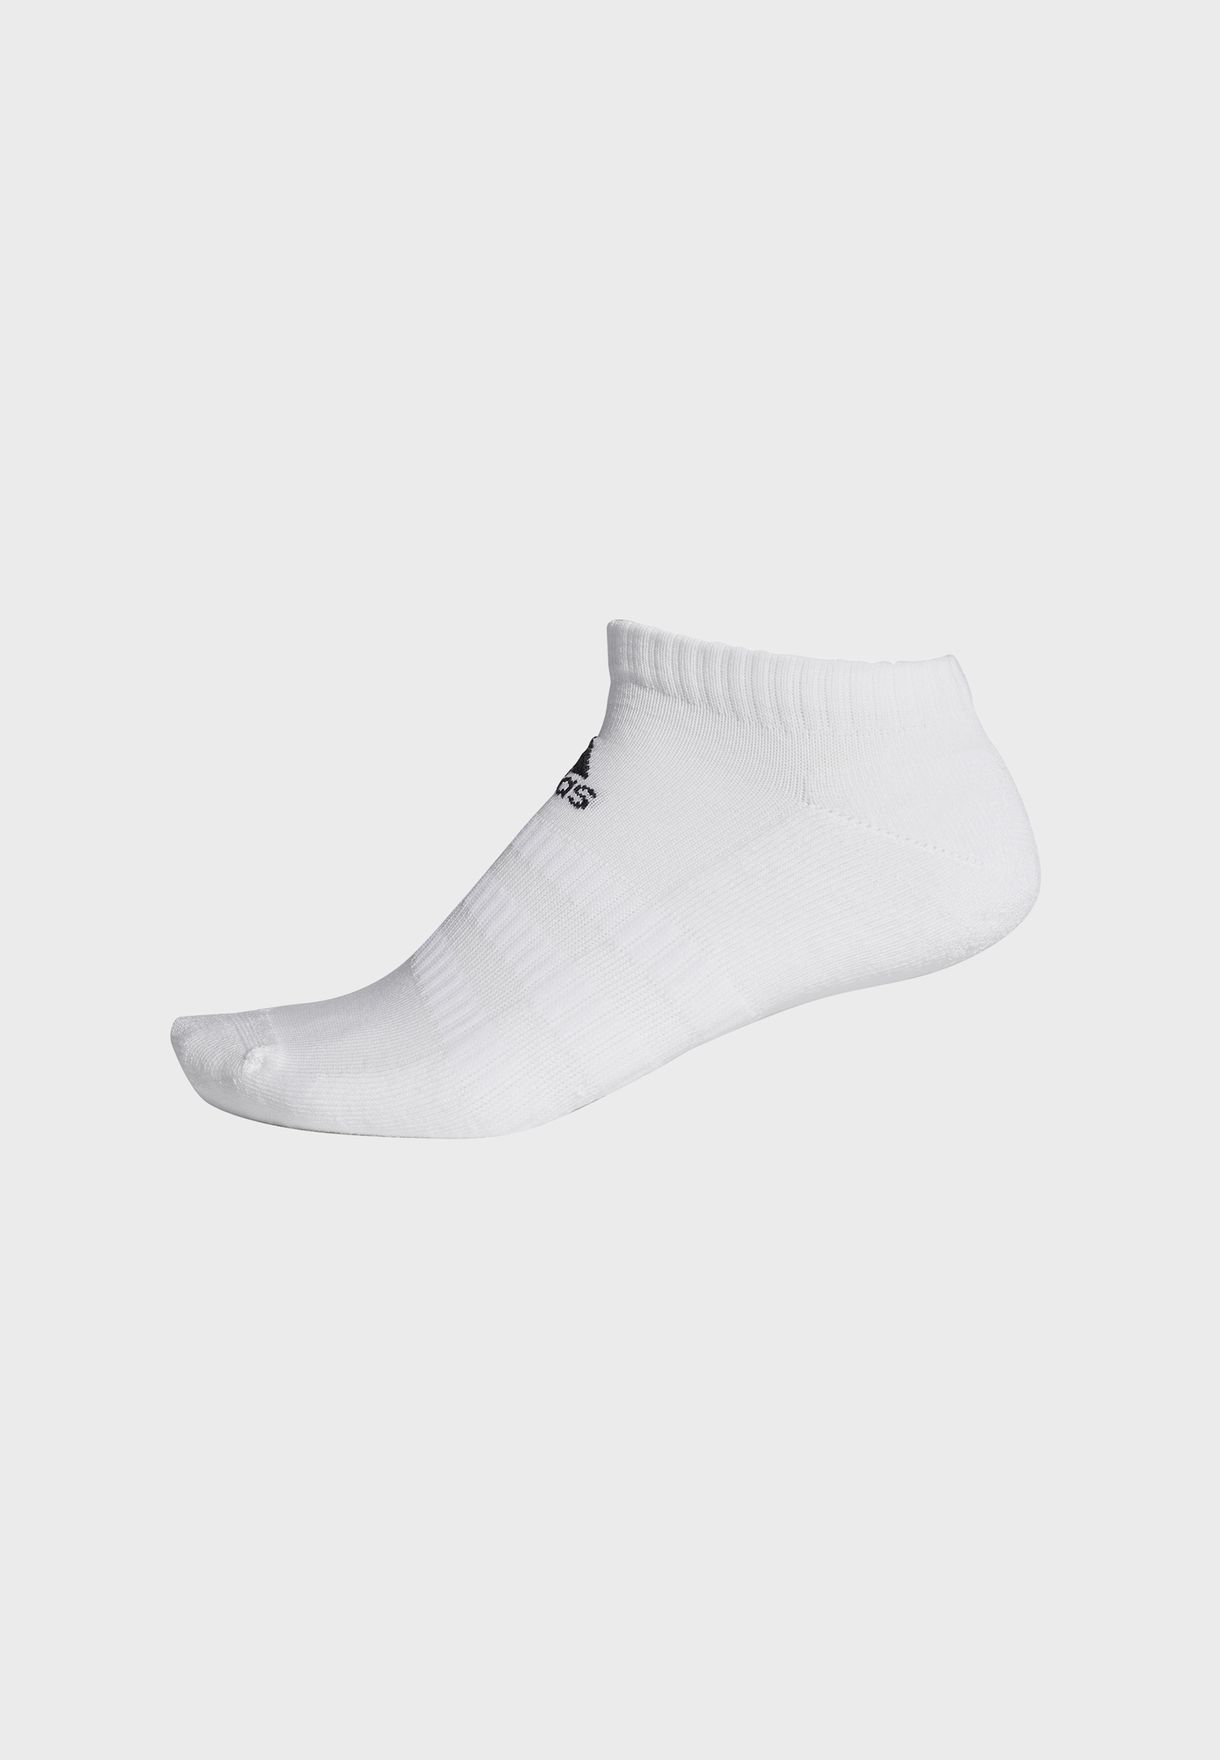 Cush Essentials Sports Training Unisex No Show Socks